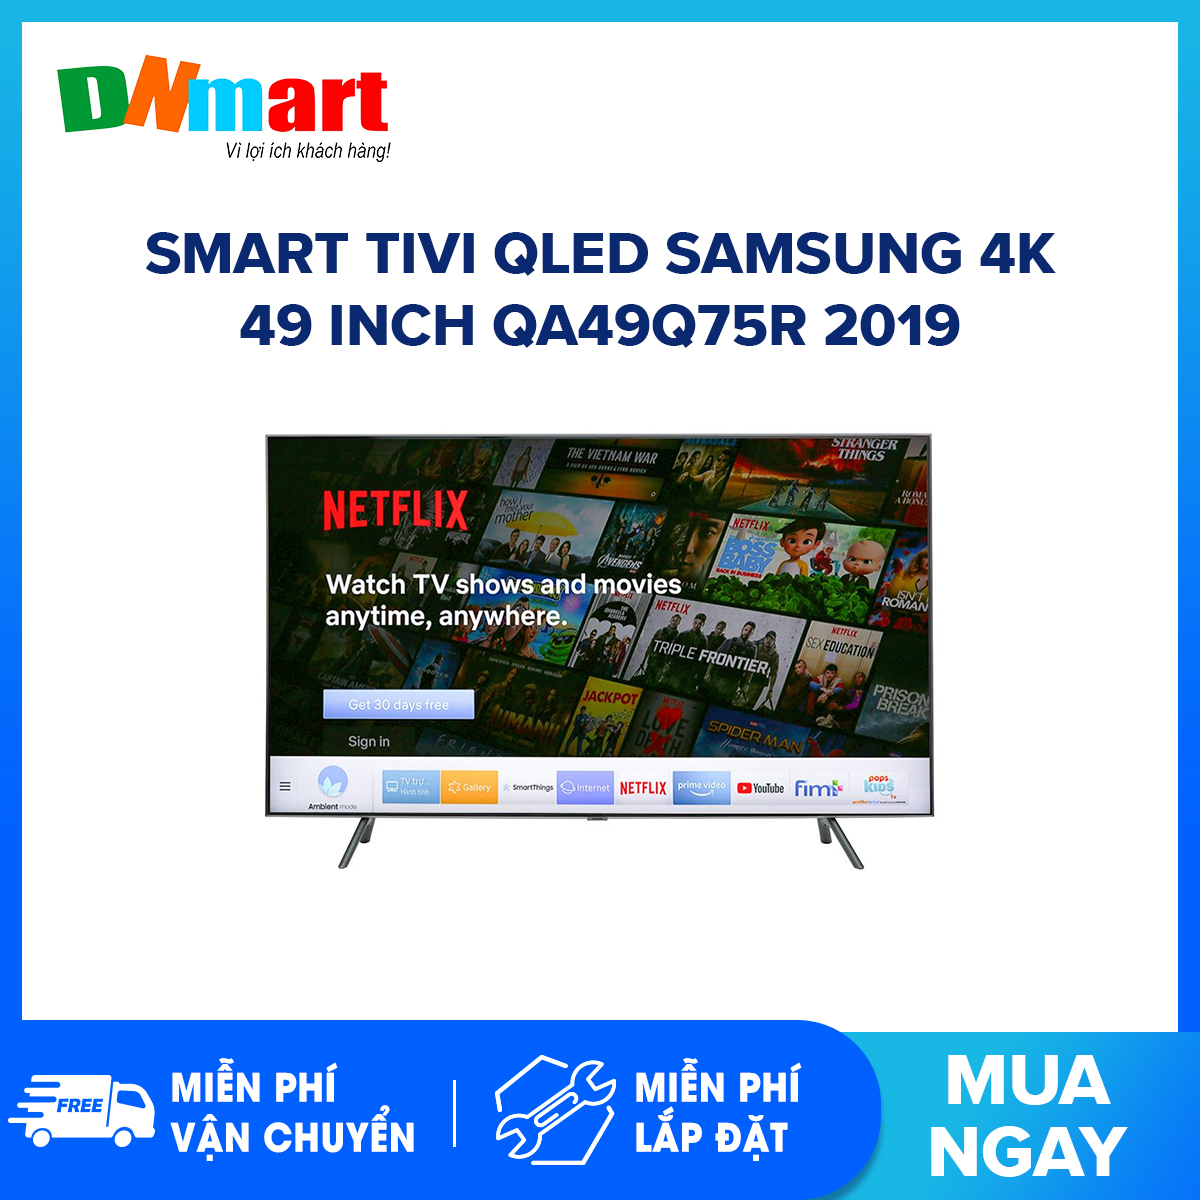 Bảng giá Smart Tivi QLED Samsung 4K 49 inch QA49Q75R Mẫu 2019